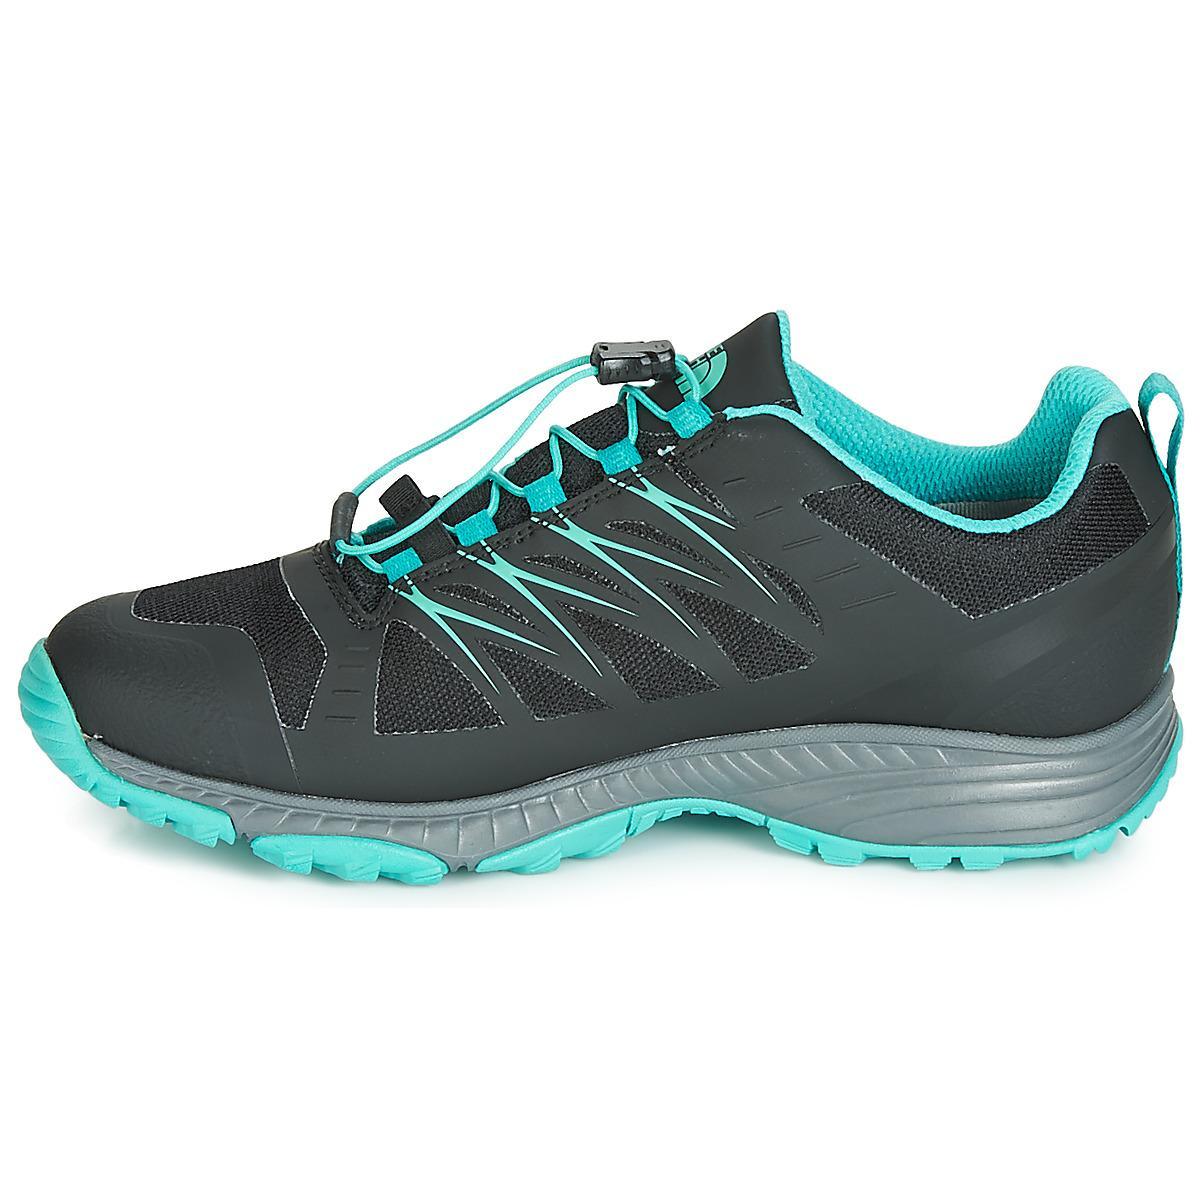 56e1cfe98 Women's Black Venture Fastlace Gtx Running Trainers